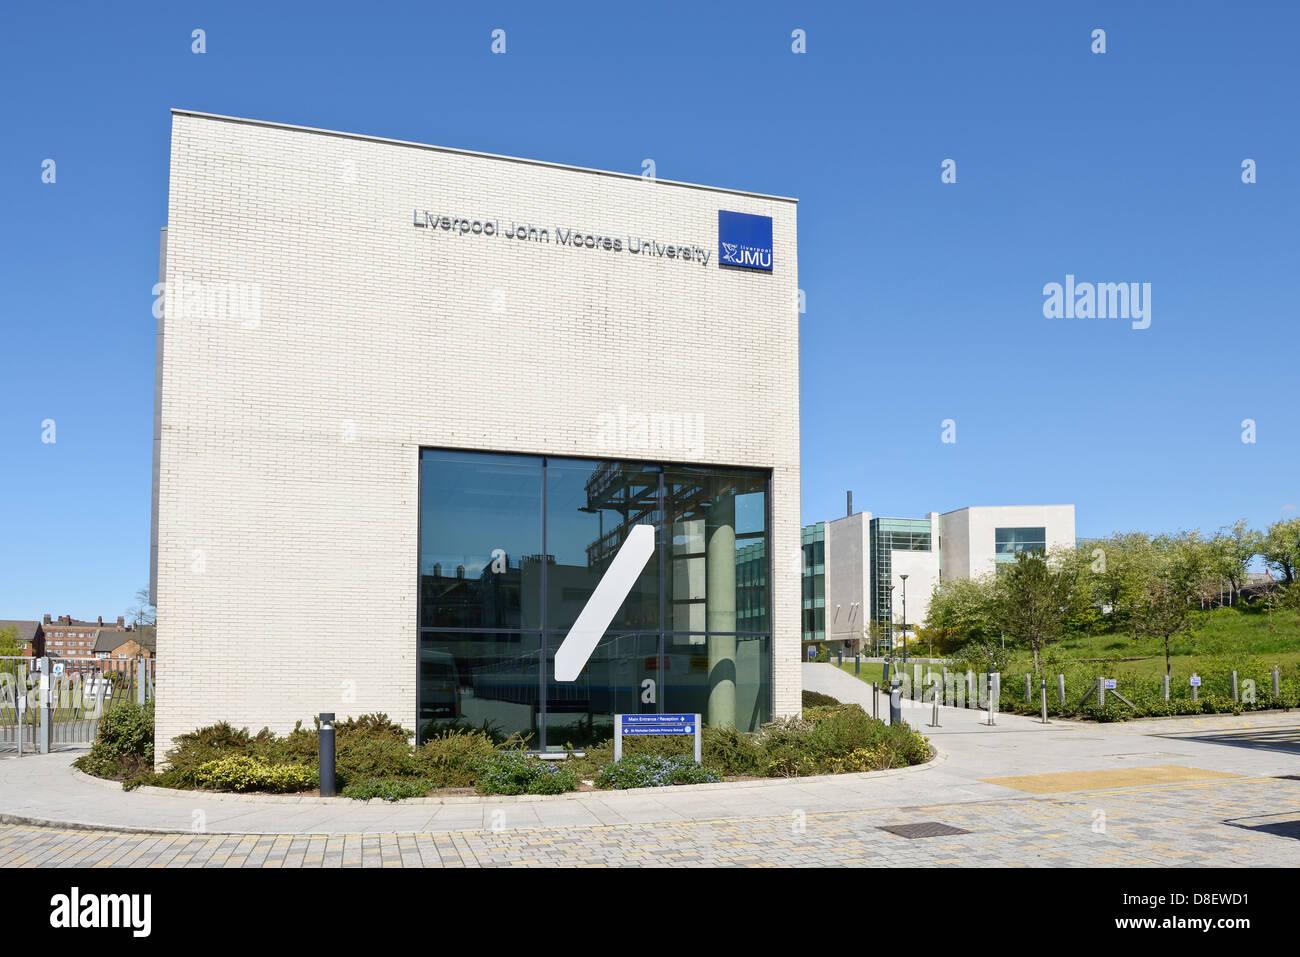 LJMU Liverpool John Moores University buildings - Stock Image